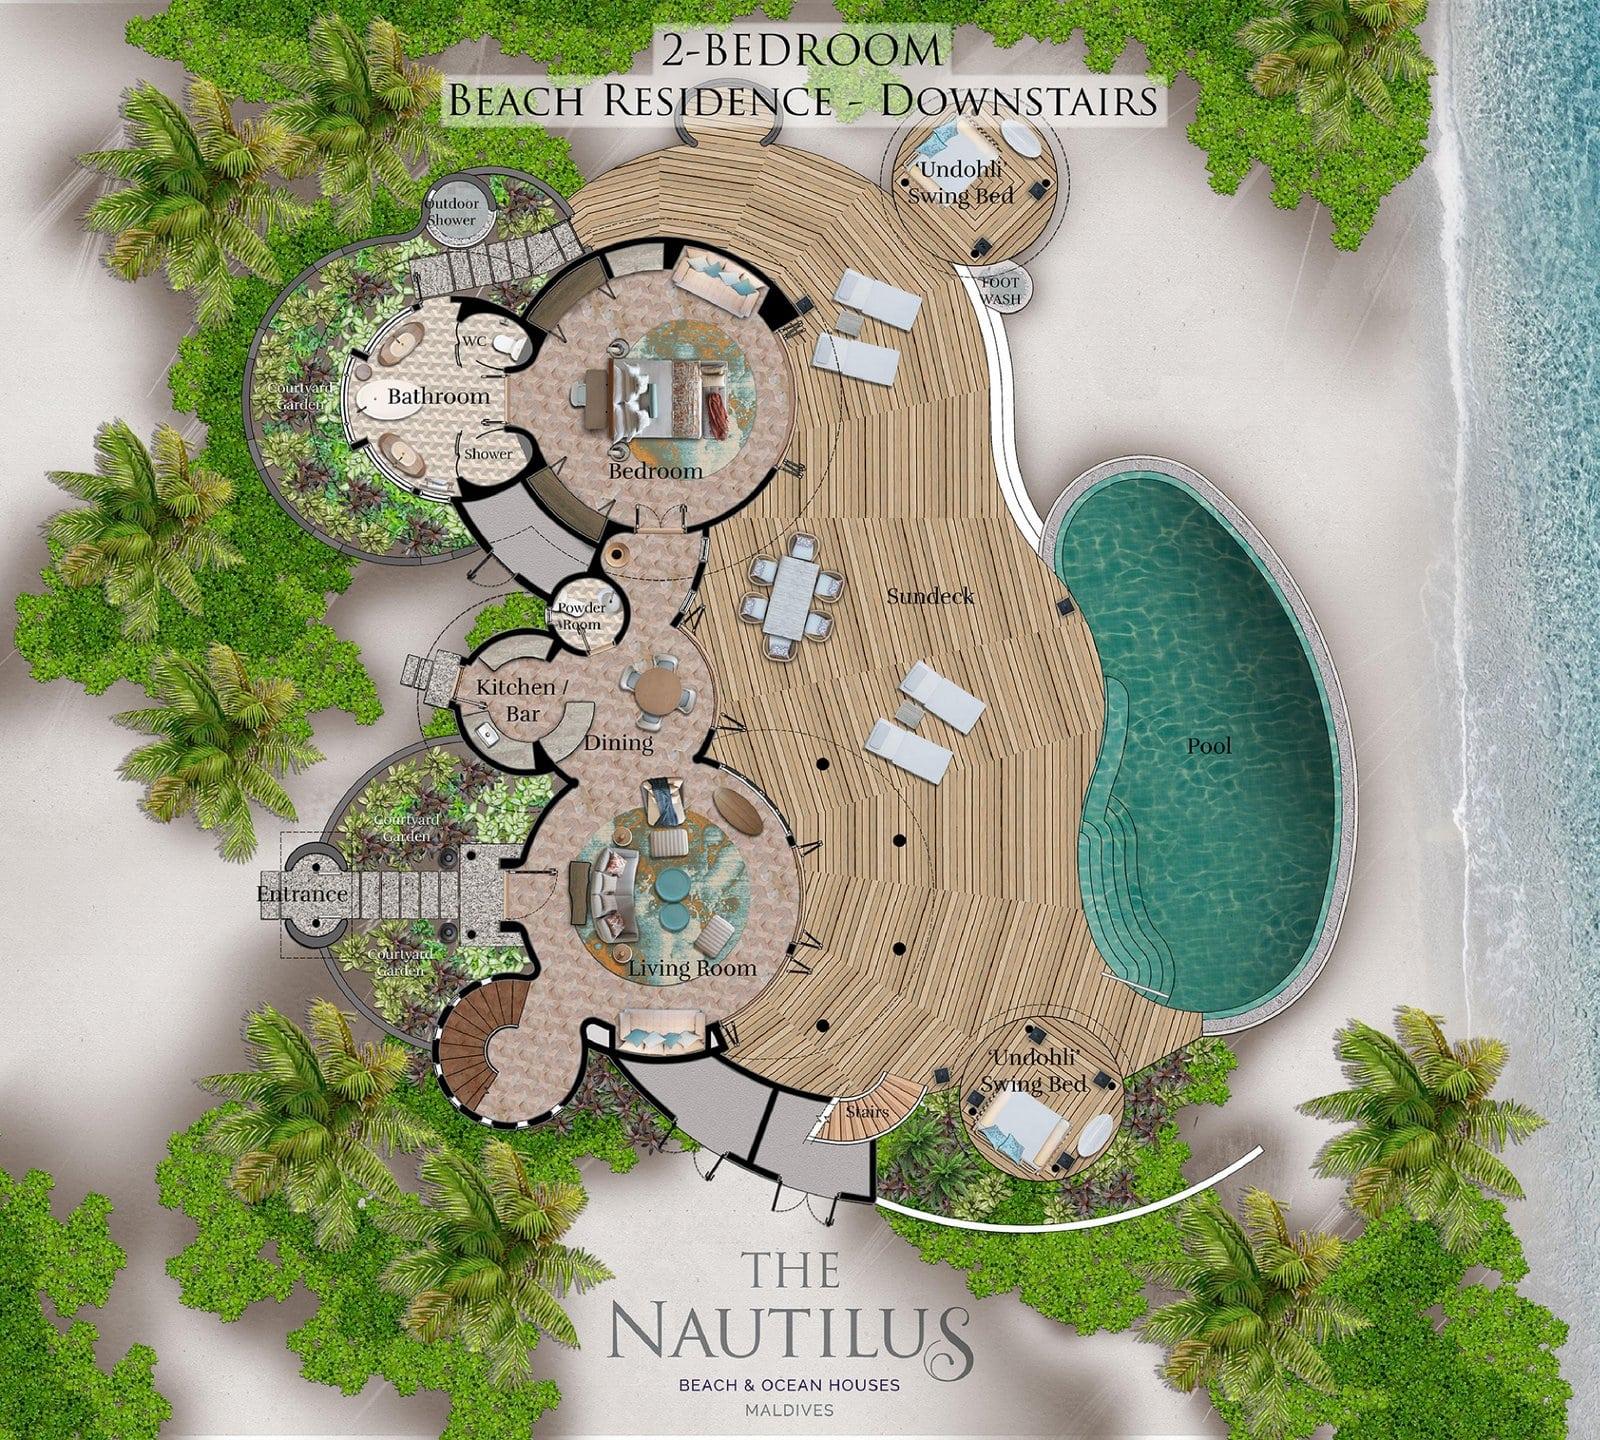 Мальдивы, отель The Nautilus Maldives, план-схема номера Two-Bedroom Beach Residence